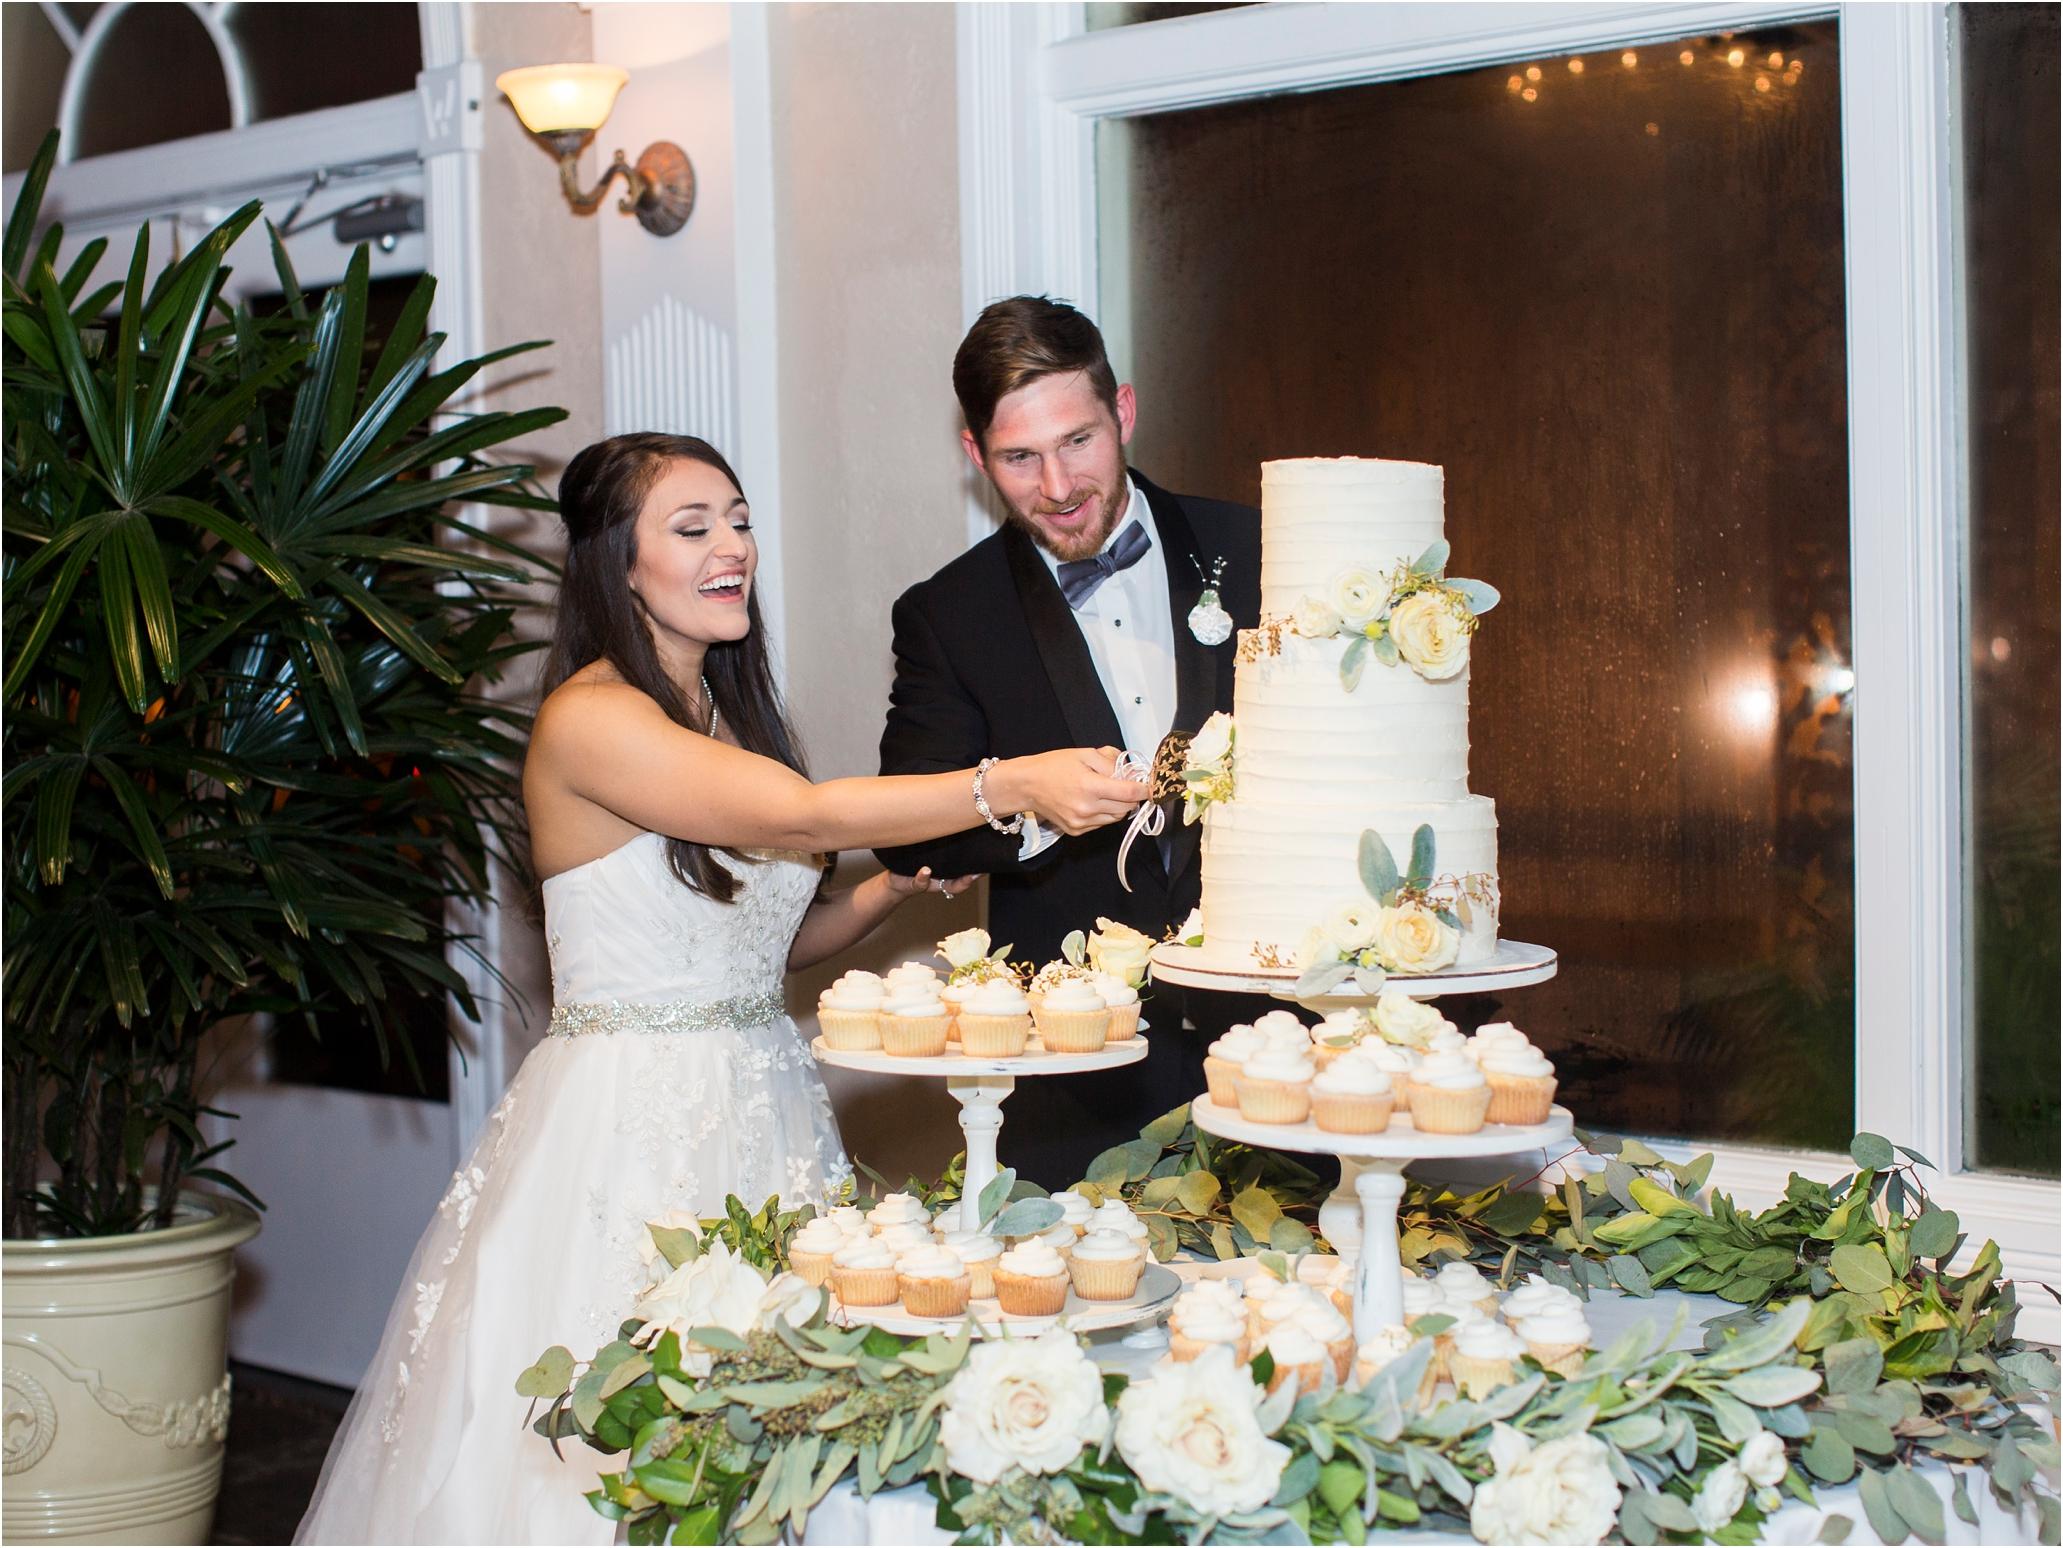 Lisa Silva Photography- Ponte Vedra Beach and Jacksonville, Florida Fine Art Film Wedding Photography- Wedding at The White Room Villa Blanca in St. Augustine, Florida_0069.jpg